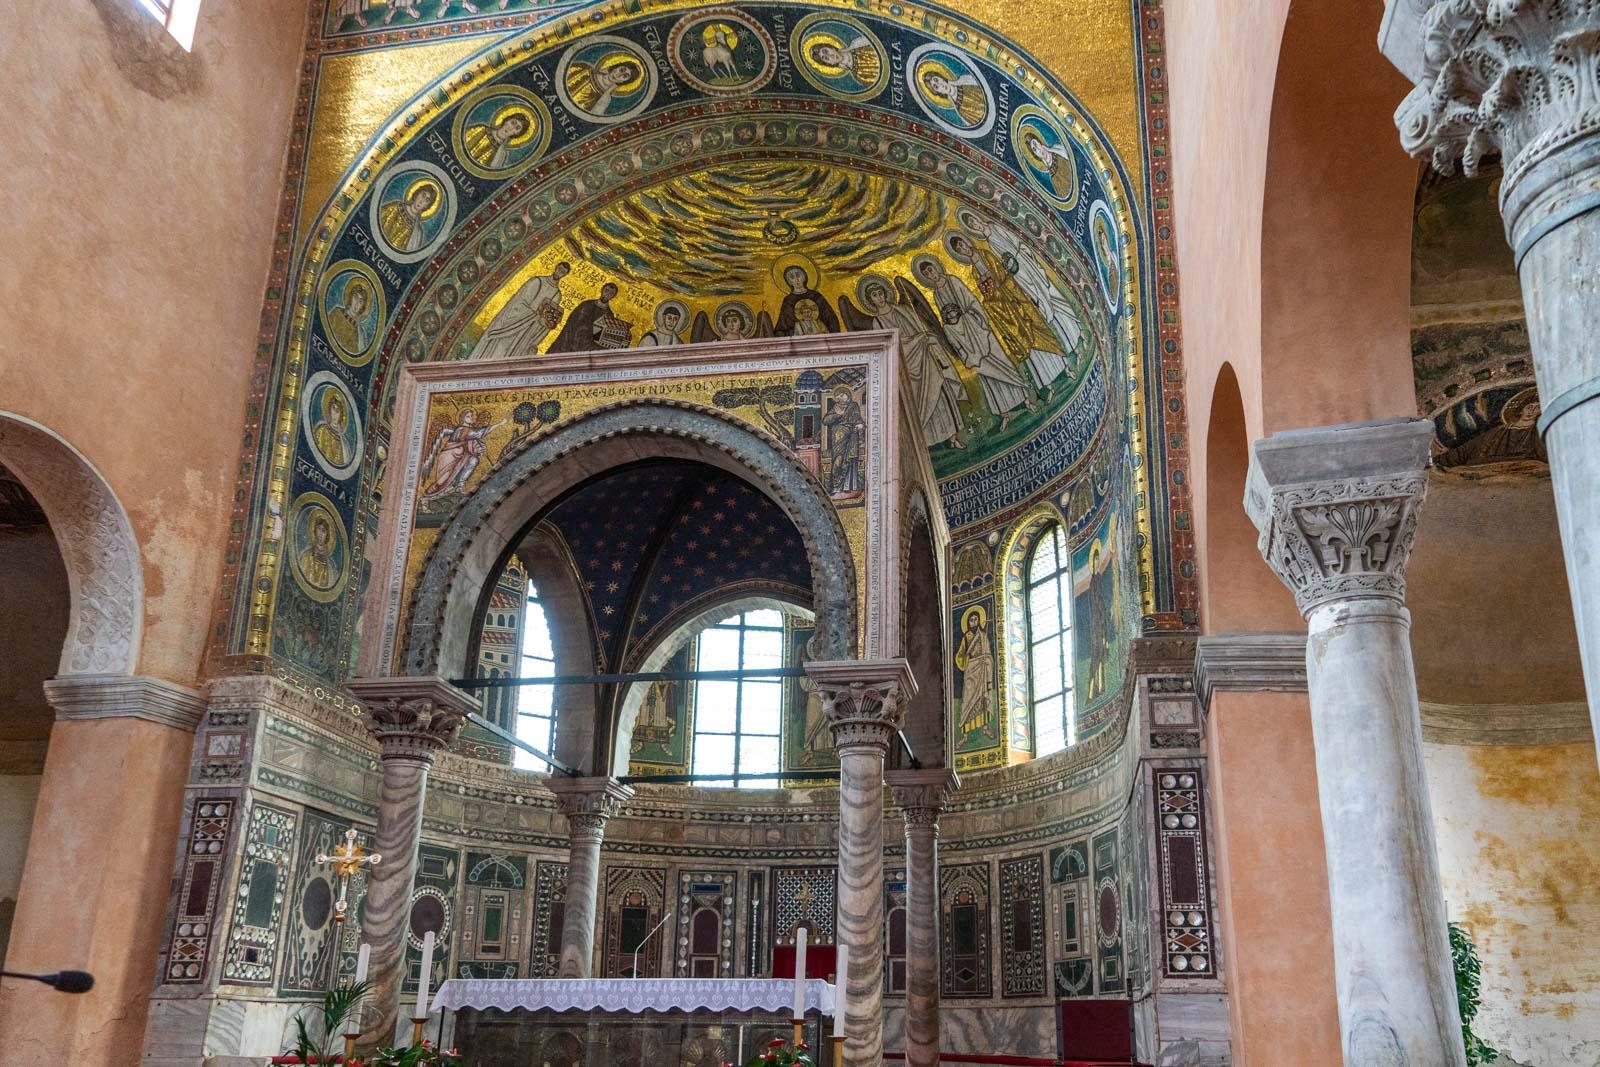 The Euphrasian Basilica in Poreč, Croatia